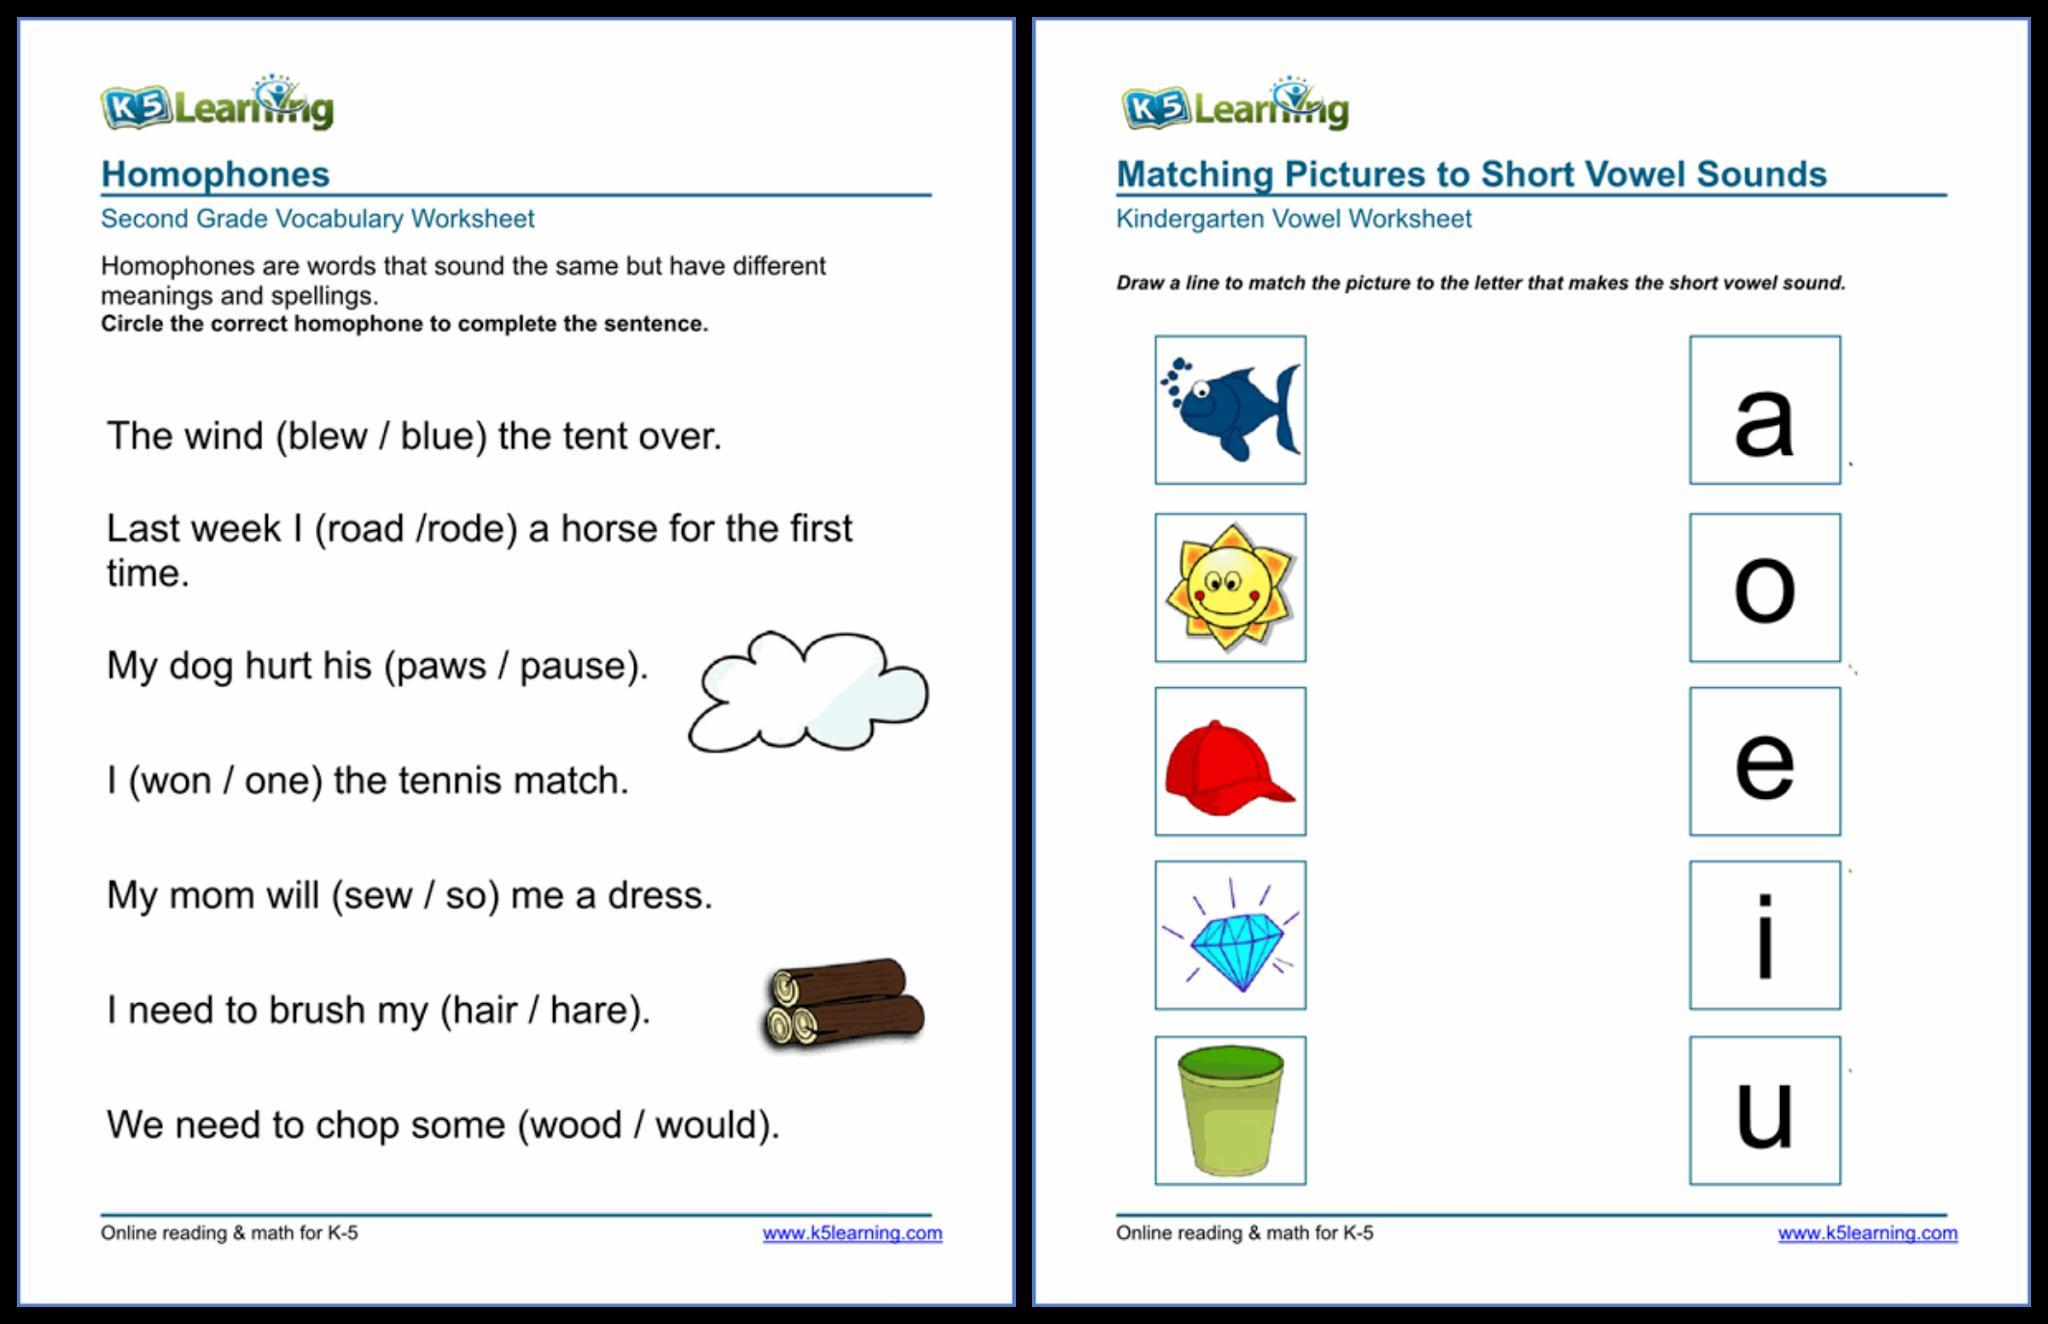 Multiplication Worksheets K5 Learning 2